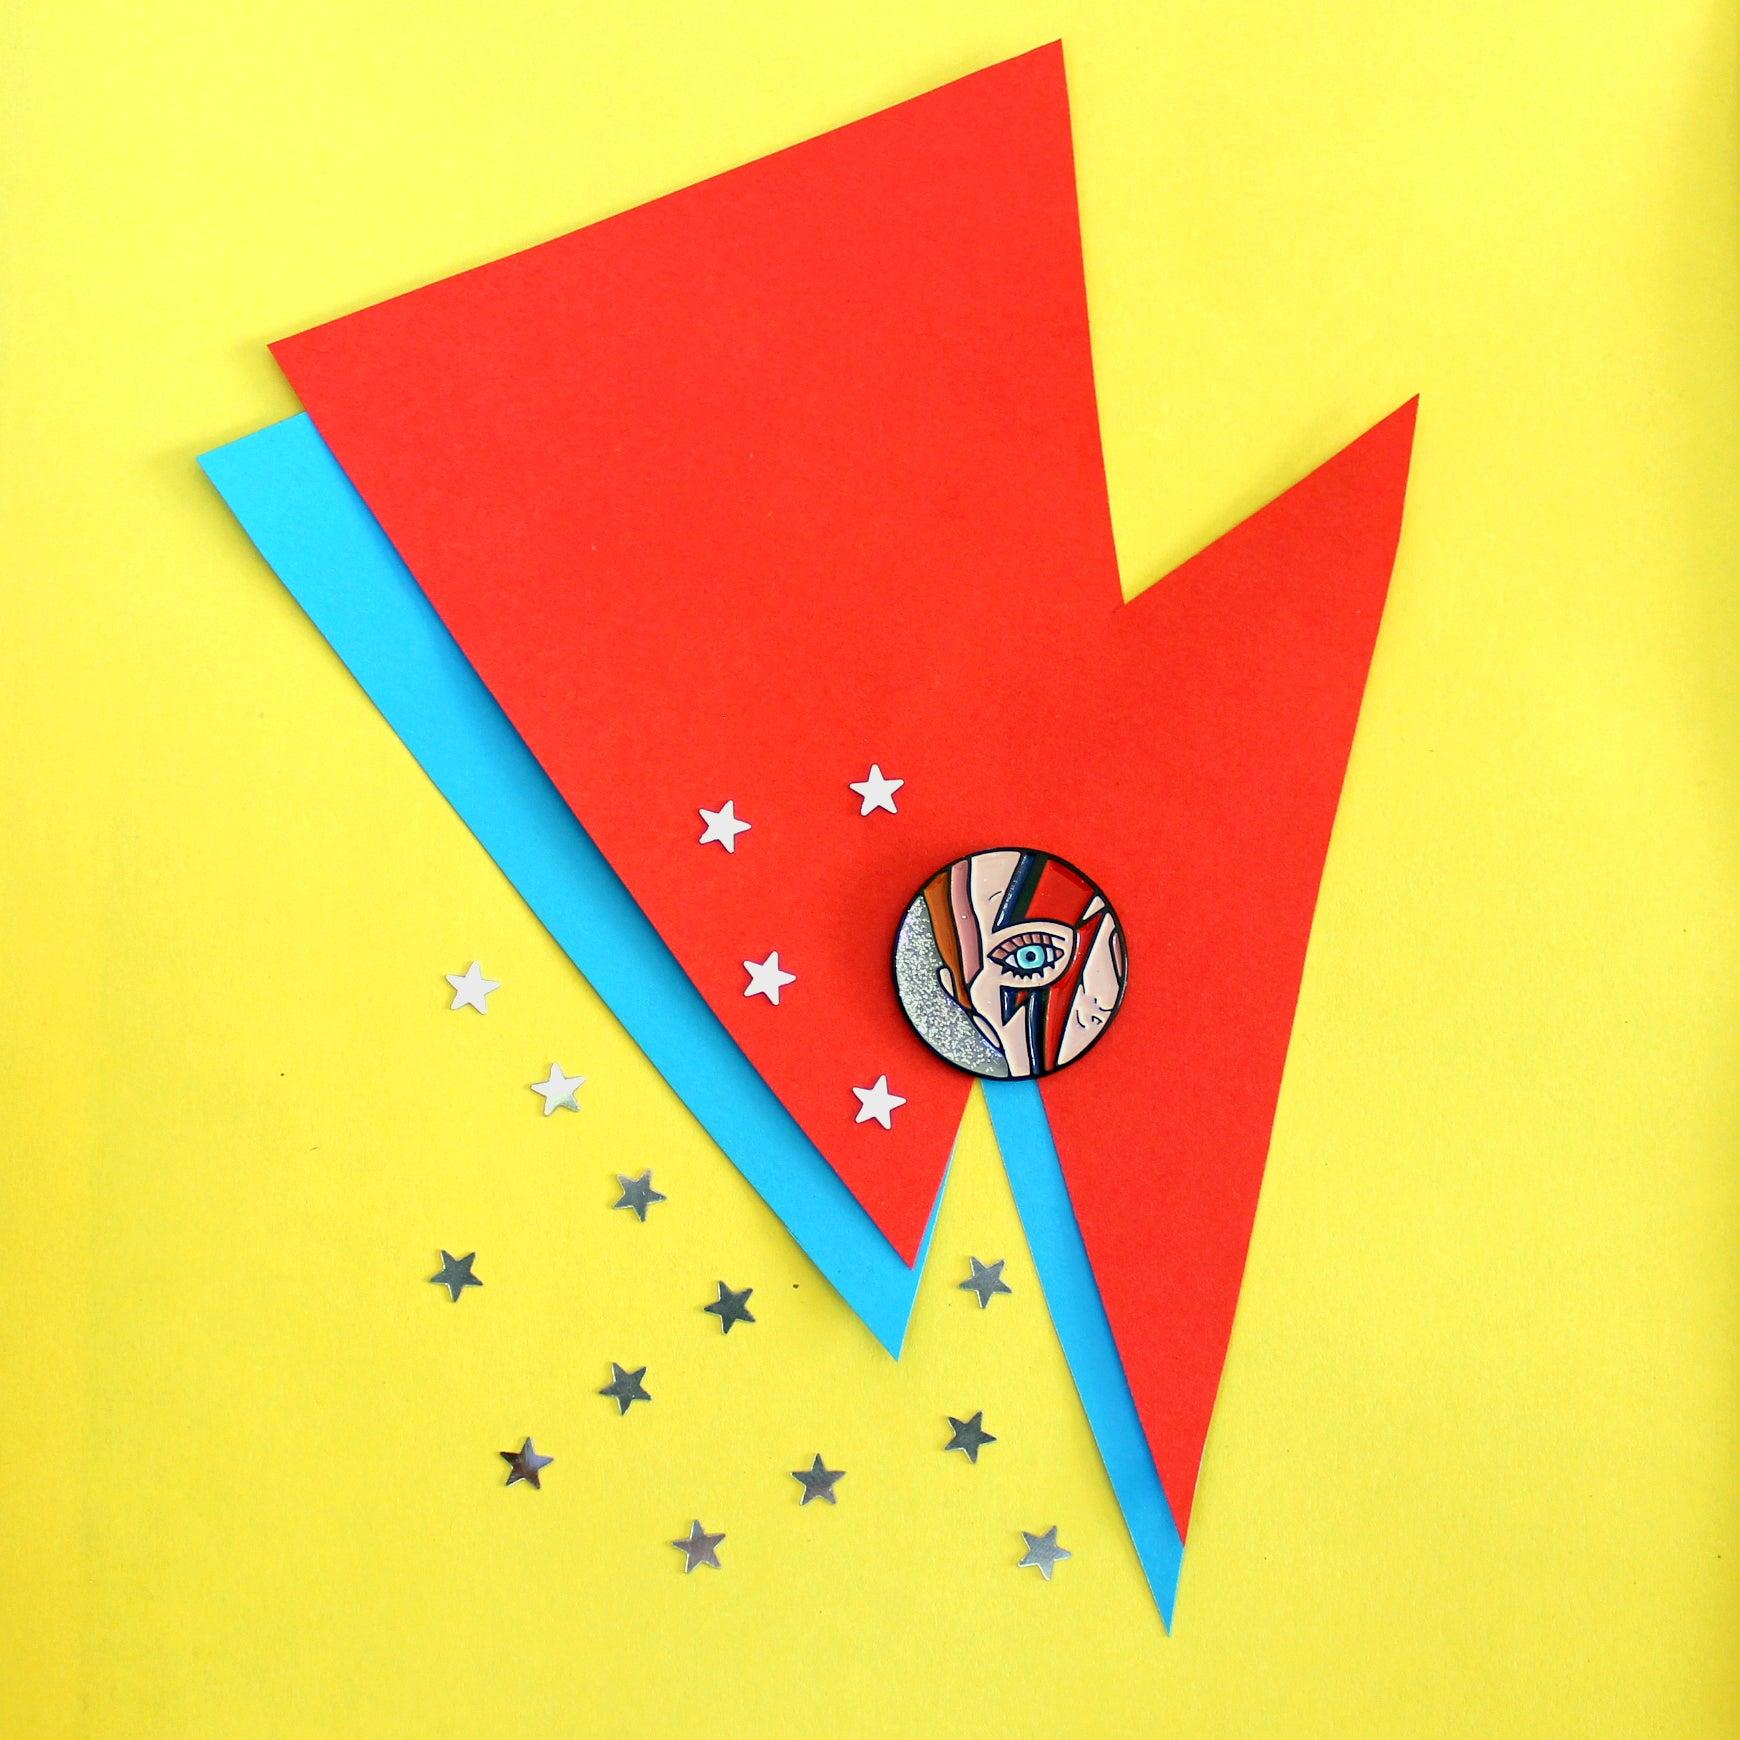 Image of Lightning bolt makeup David Bowie inspired glitter enamel pin ...  sc 1 st  Clorty Cat Crafts & Clorty Cat Crafts u2014 Lightning bolt makeup David Bowie inspired ... azcodes.com